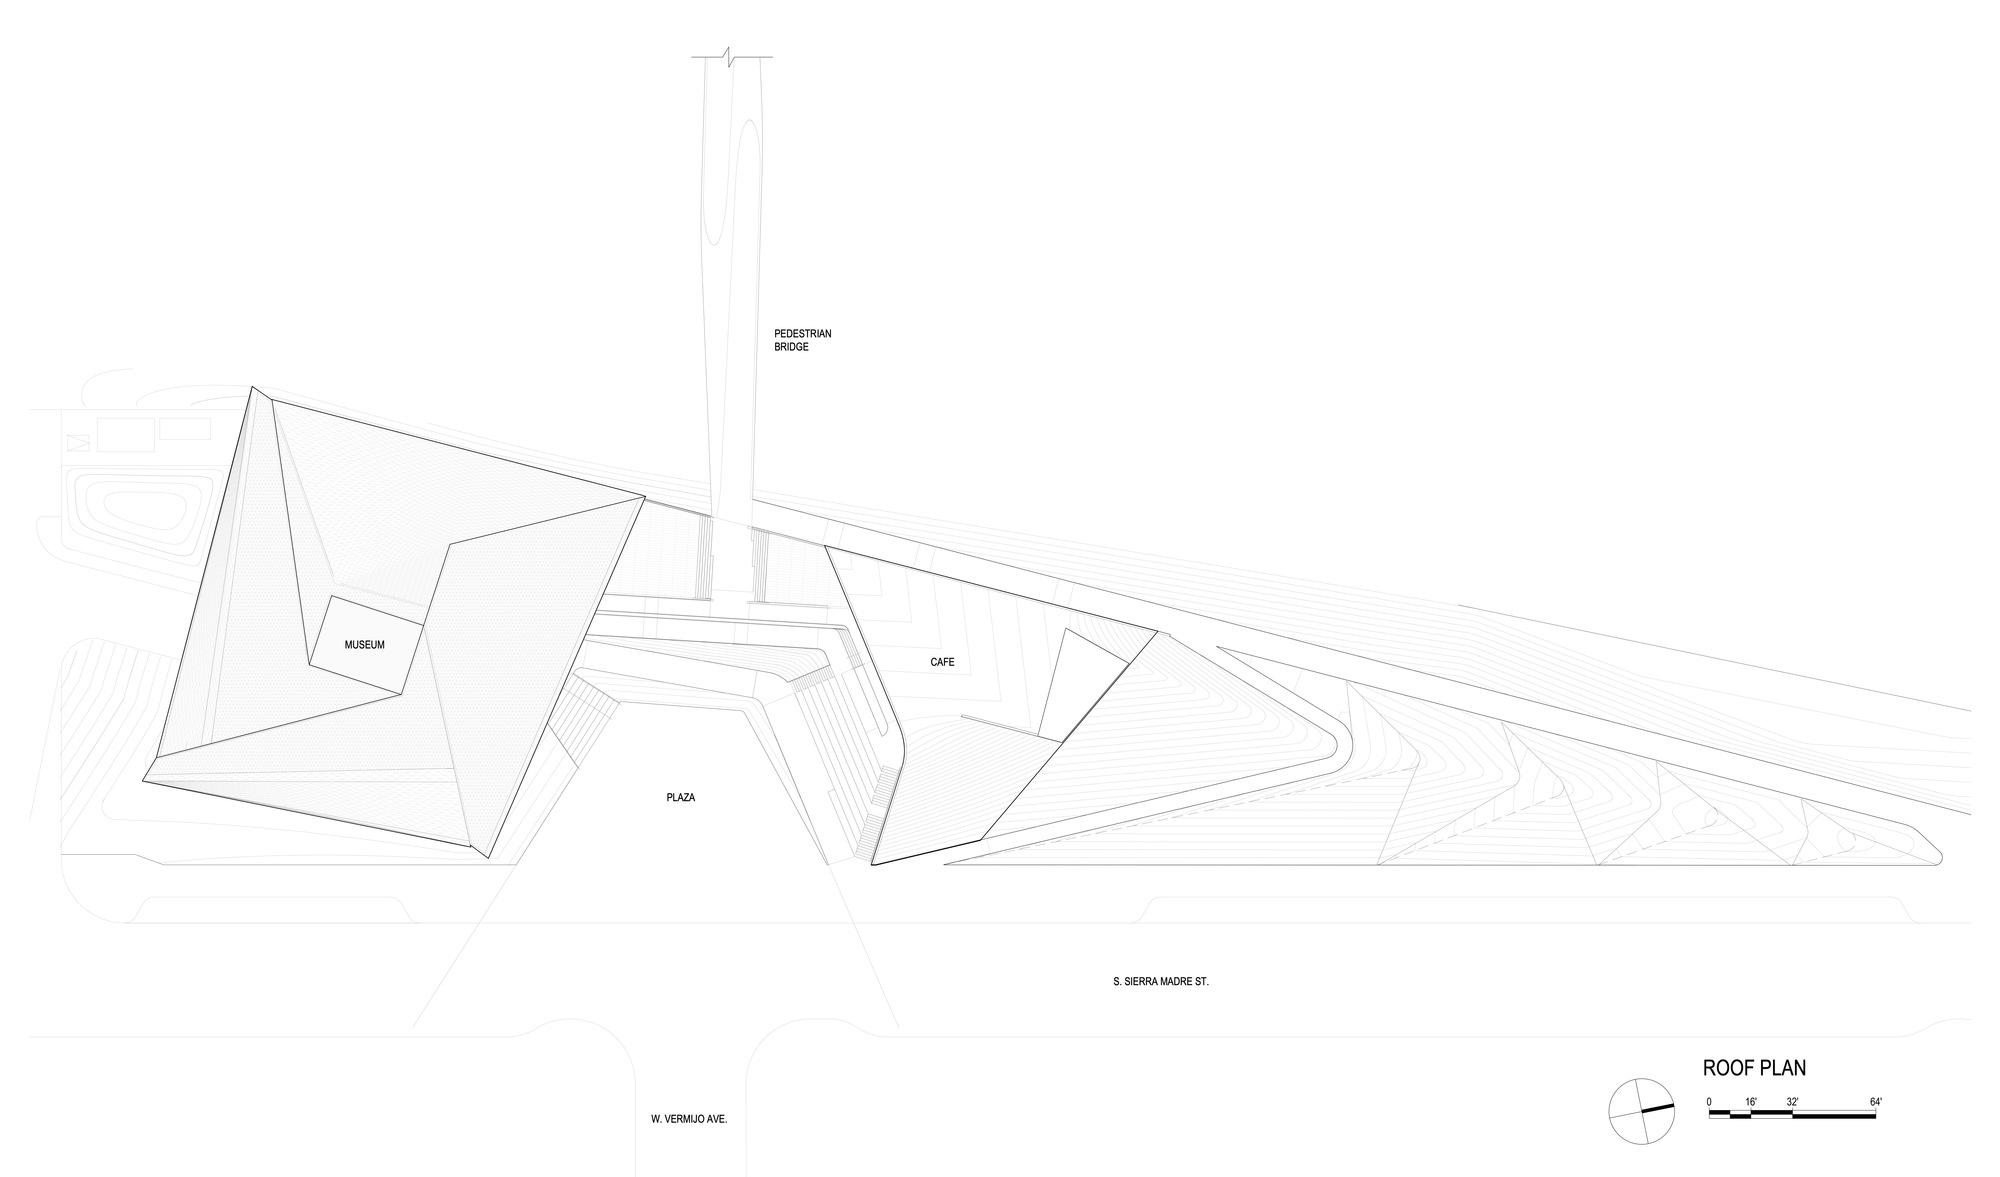 m4 _USOPM_Plans.jpg